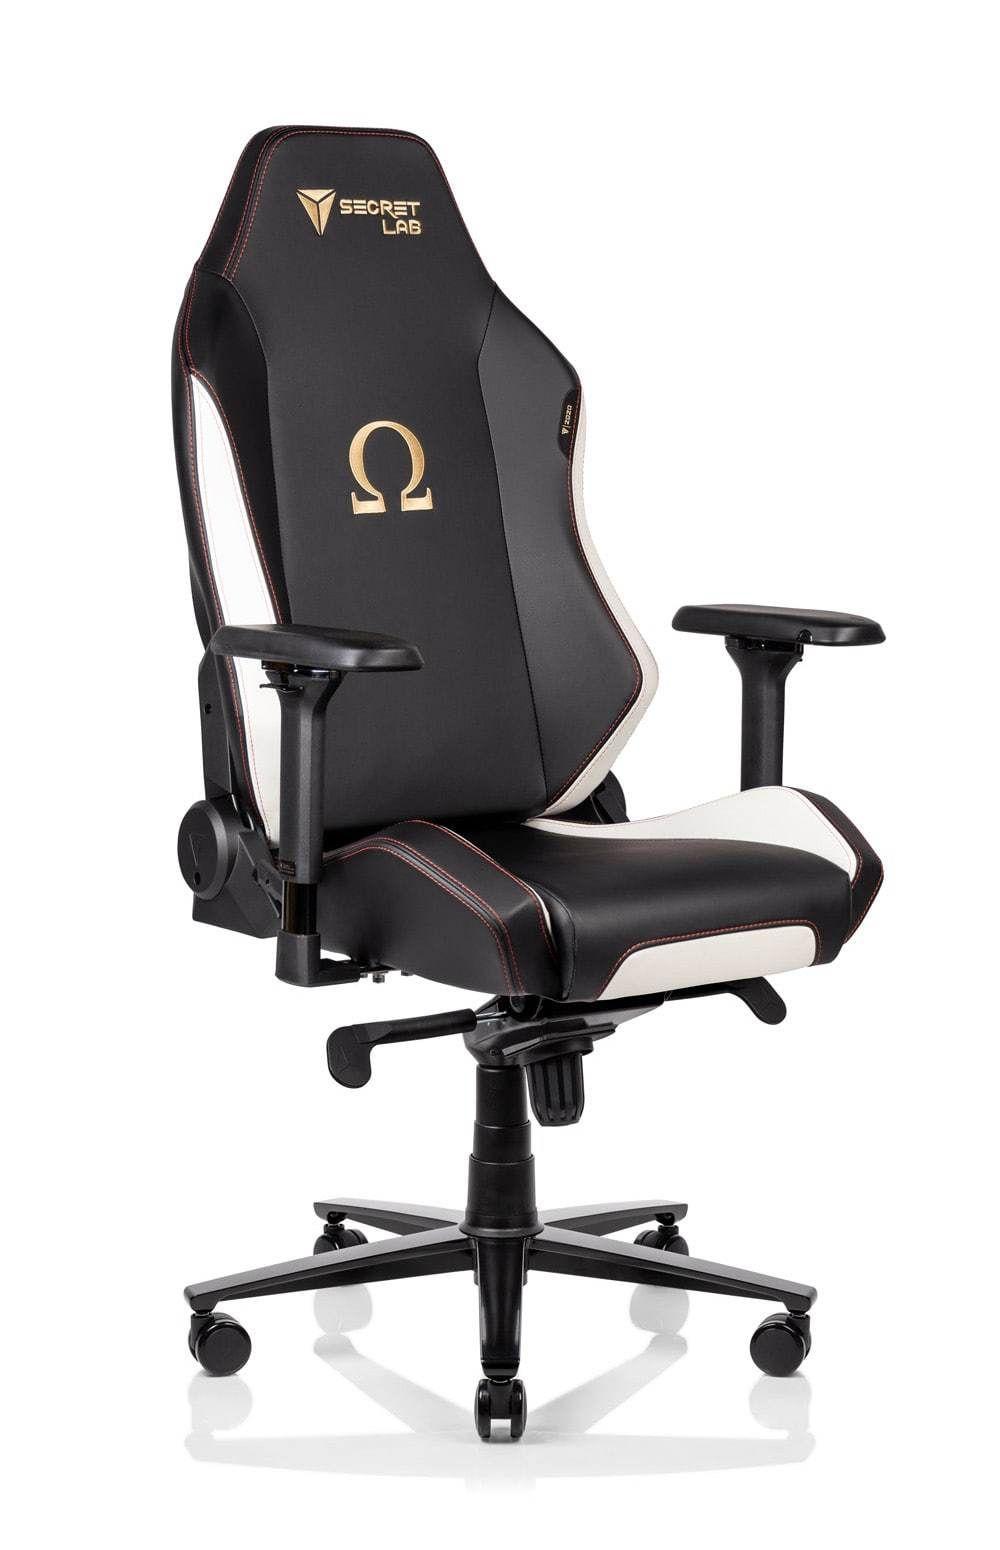 OMEGA Series gaming chairs Secretlab US in 2020 Gaming